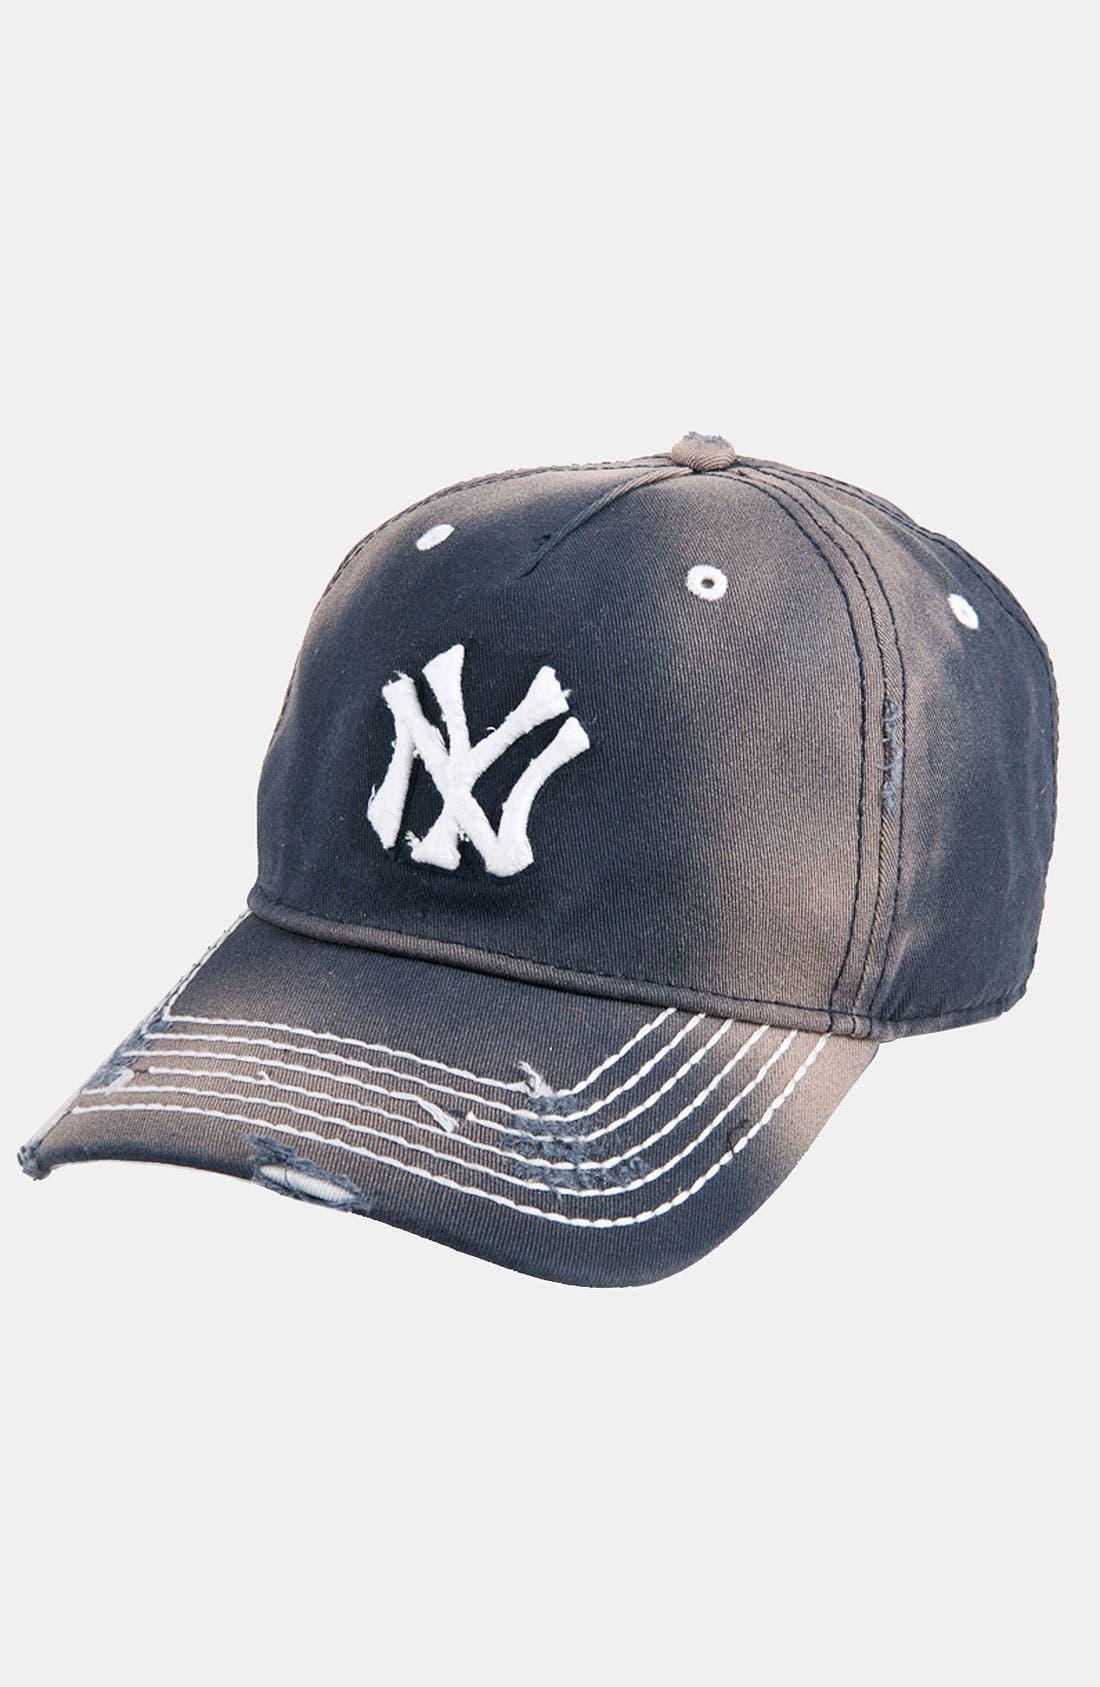 Alternate Image 1 Selected - American Needle 'New York Yankees' Distressed Cap